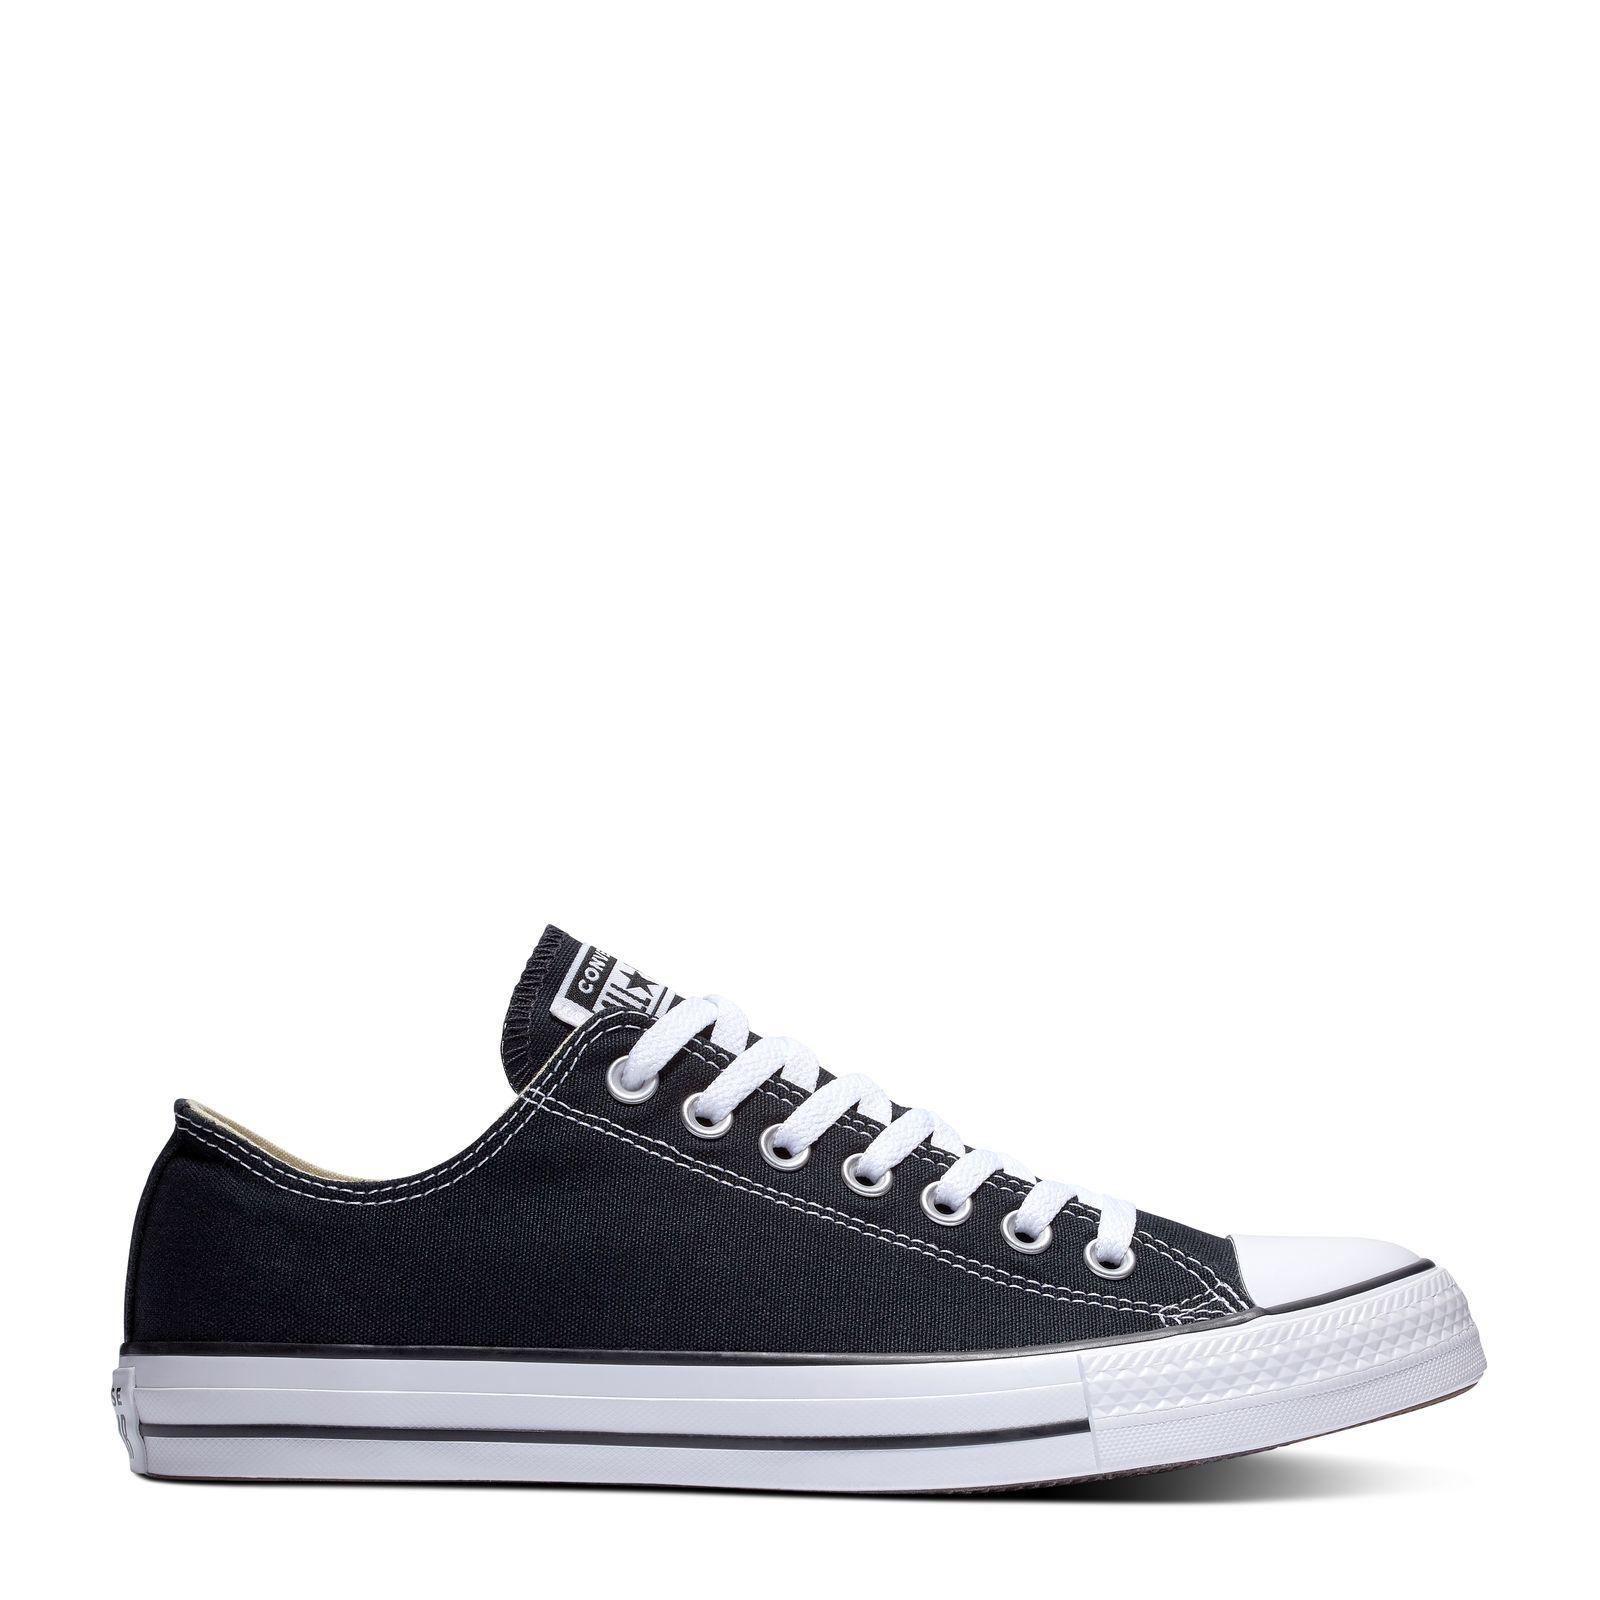 714a730b5a78 Buy Converse Shoes